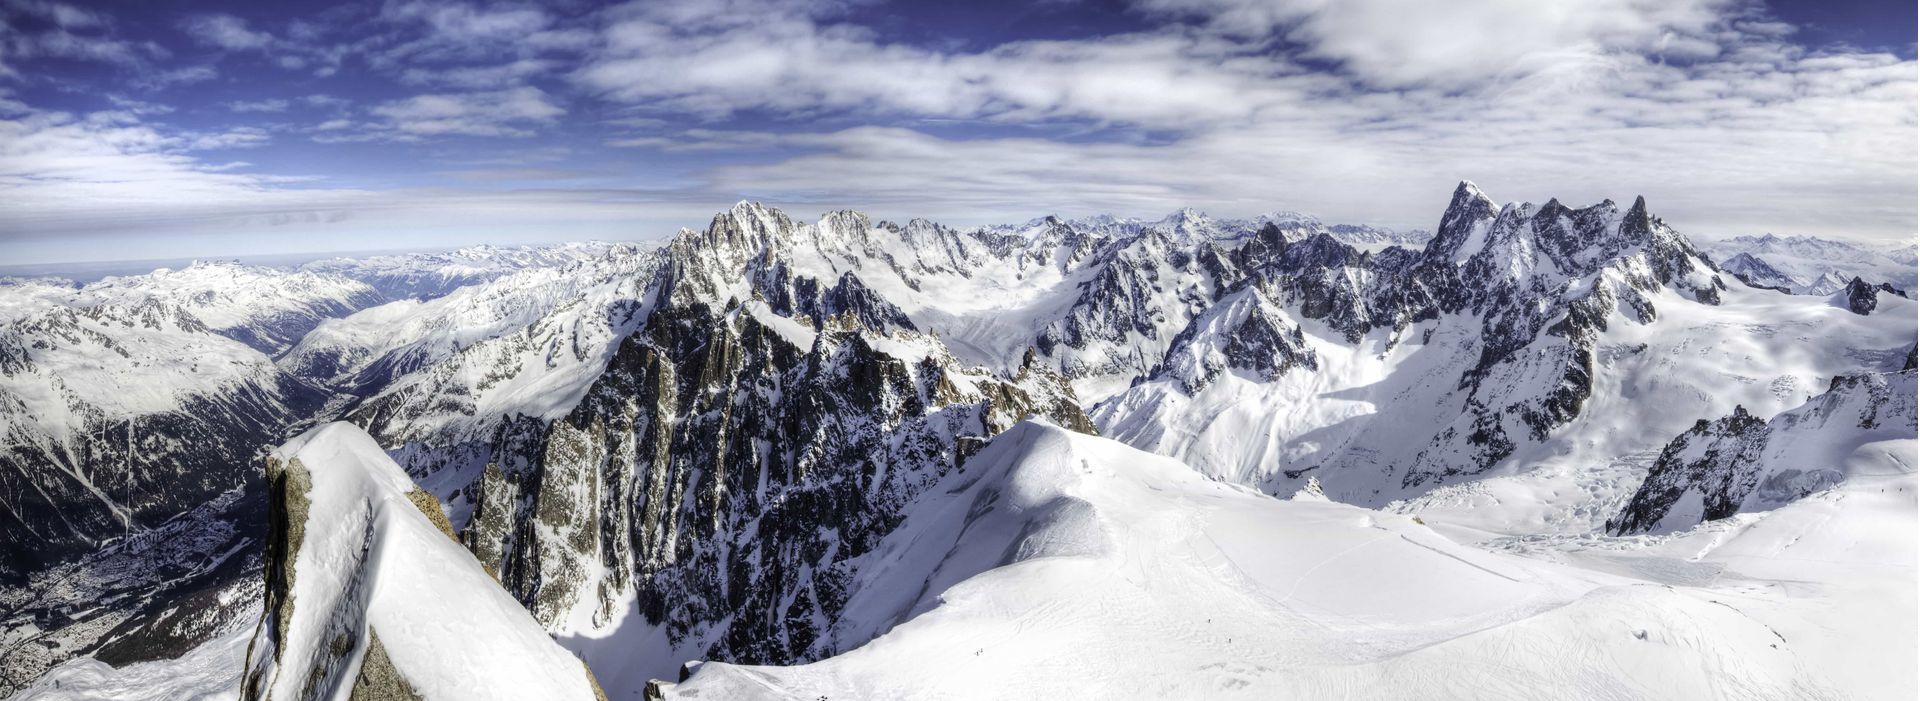 Ski The Secret Dolomites The Dolomites Original Travel